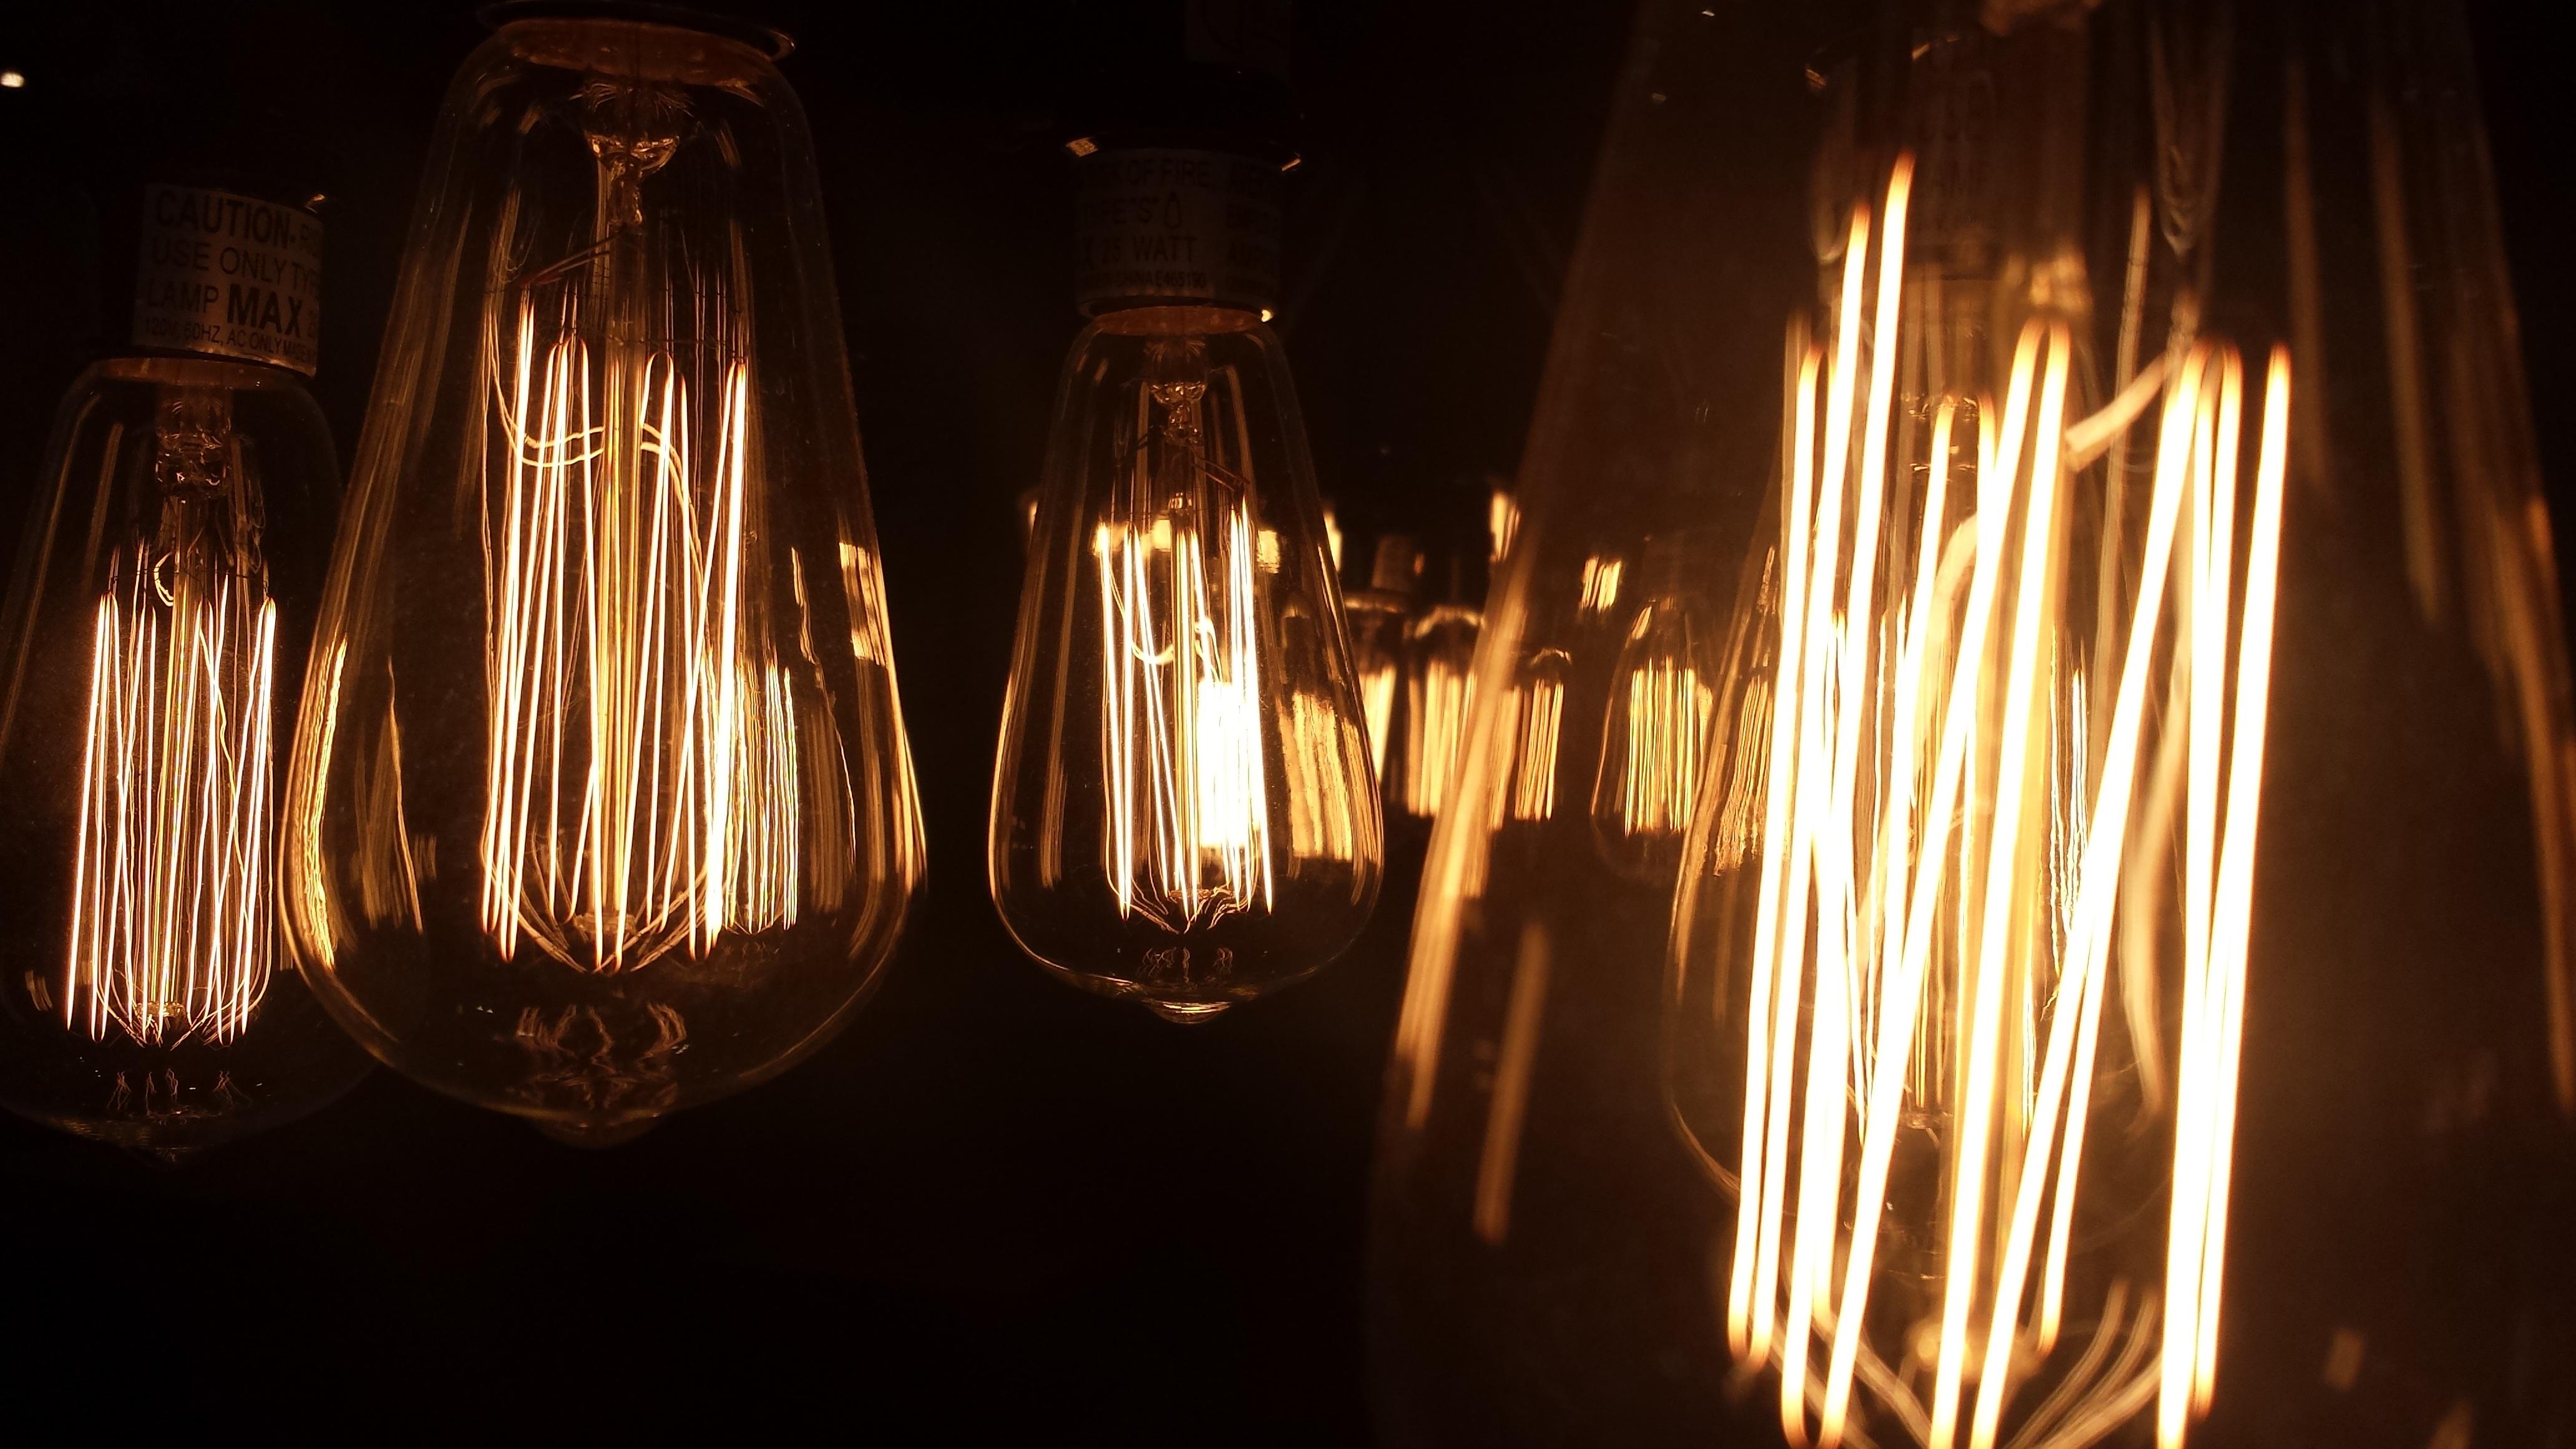 Free Images Night Retro Sparkler Lamp Light Bulb